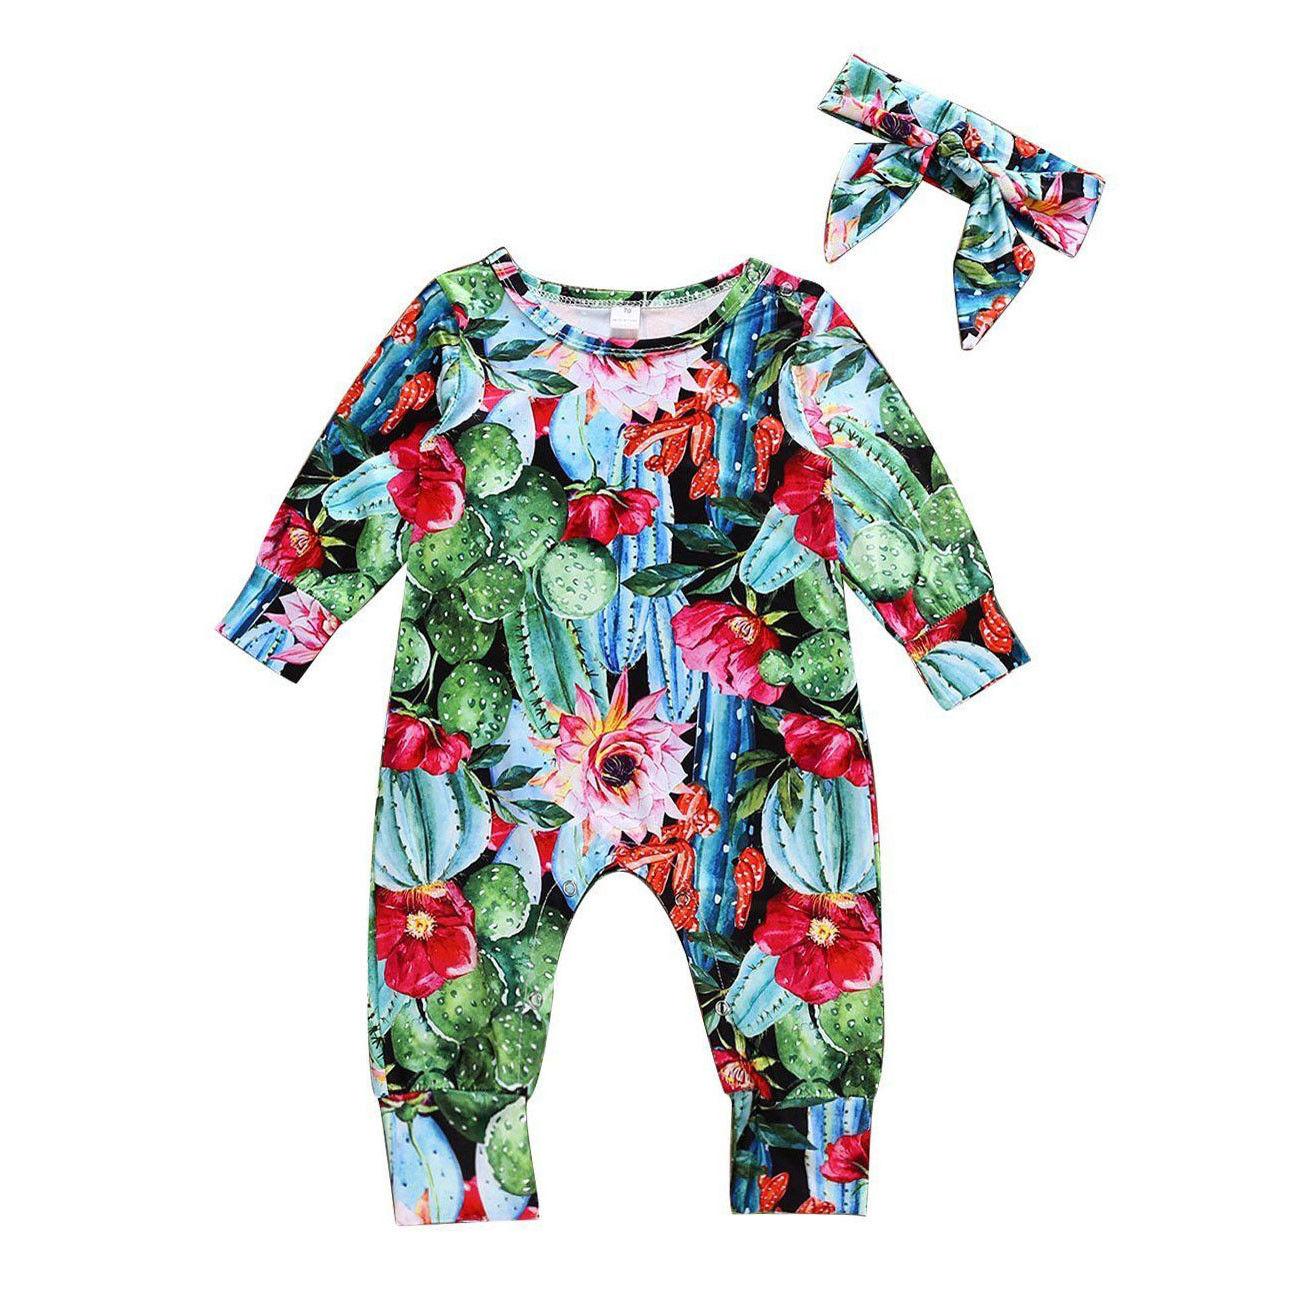 Newborn Baby Girls Romper Jumpsuit Bodysuit Infant Headband Clothes Outfits Set